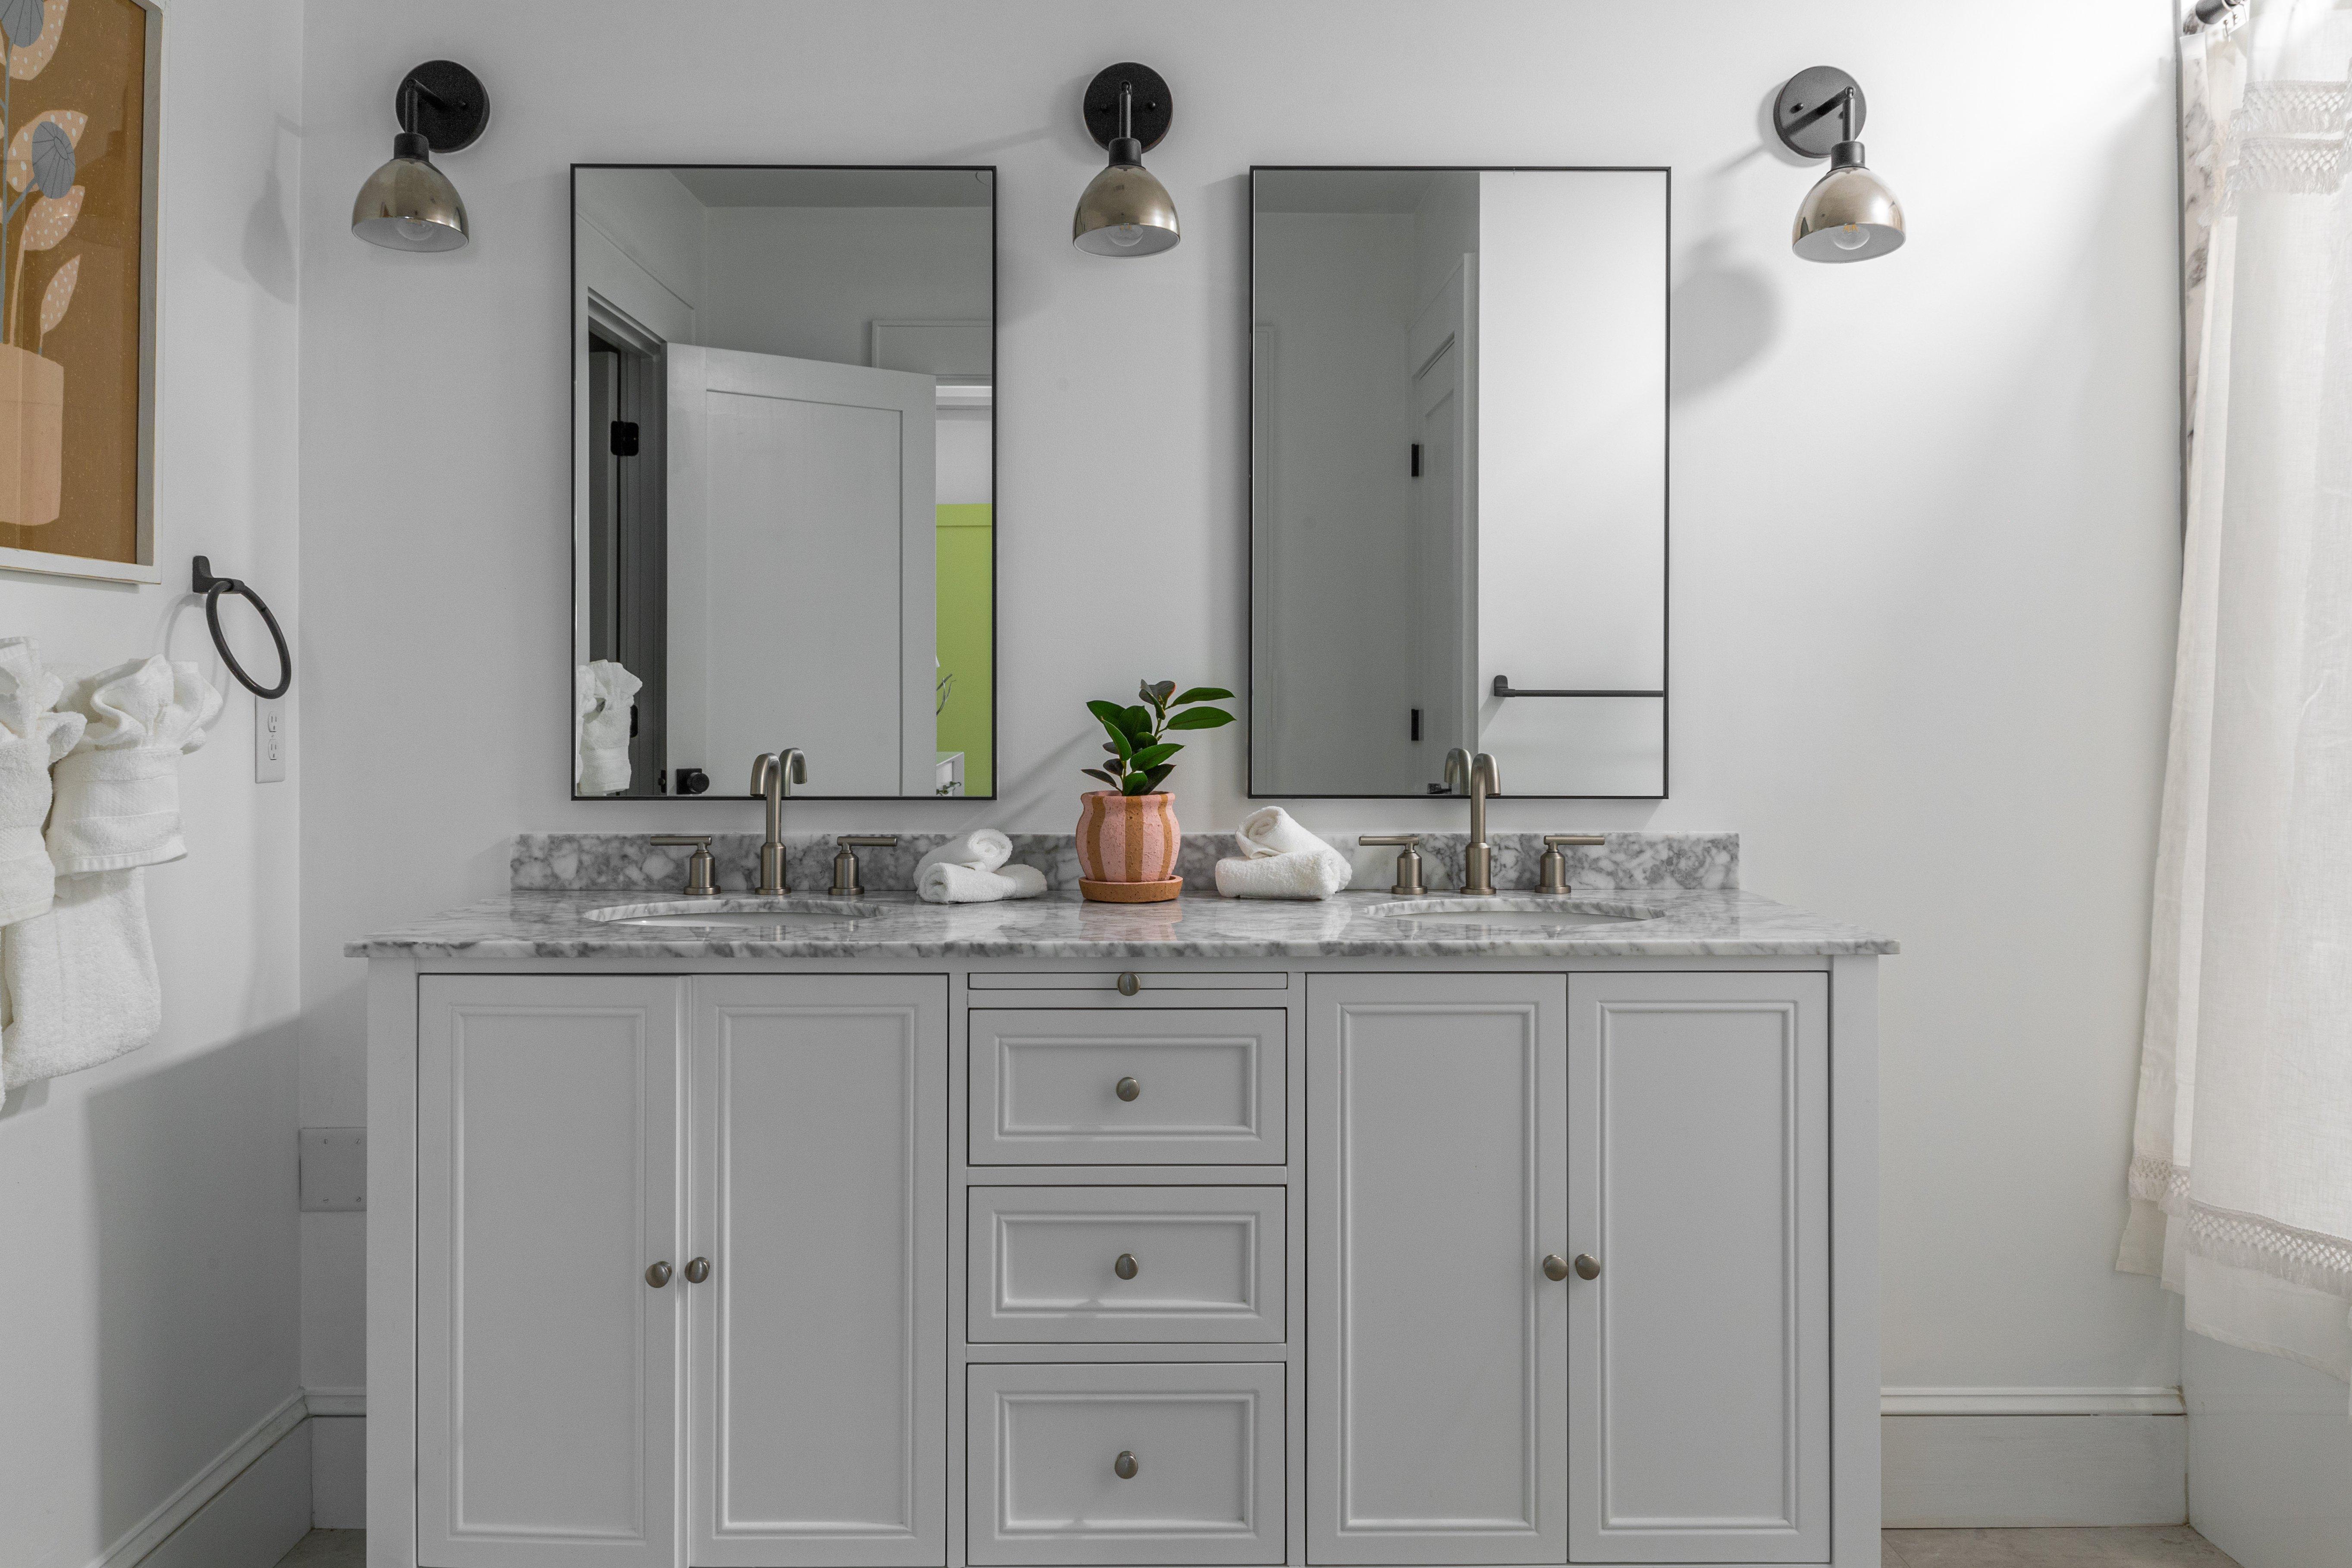 06 master bathroom 20210721-IMG_0449-HDR.jpg